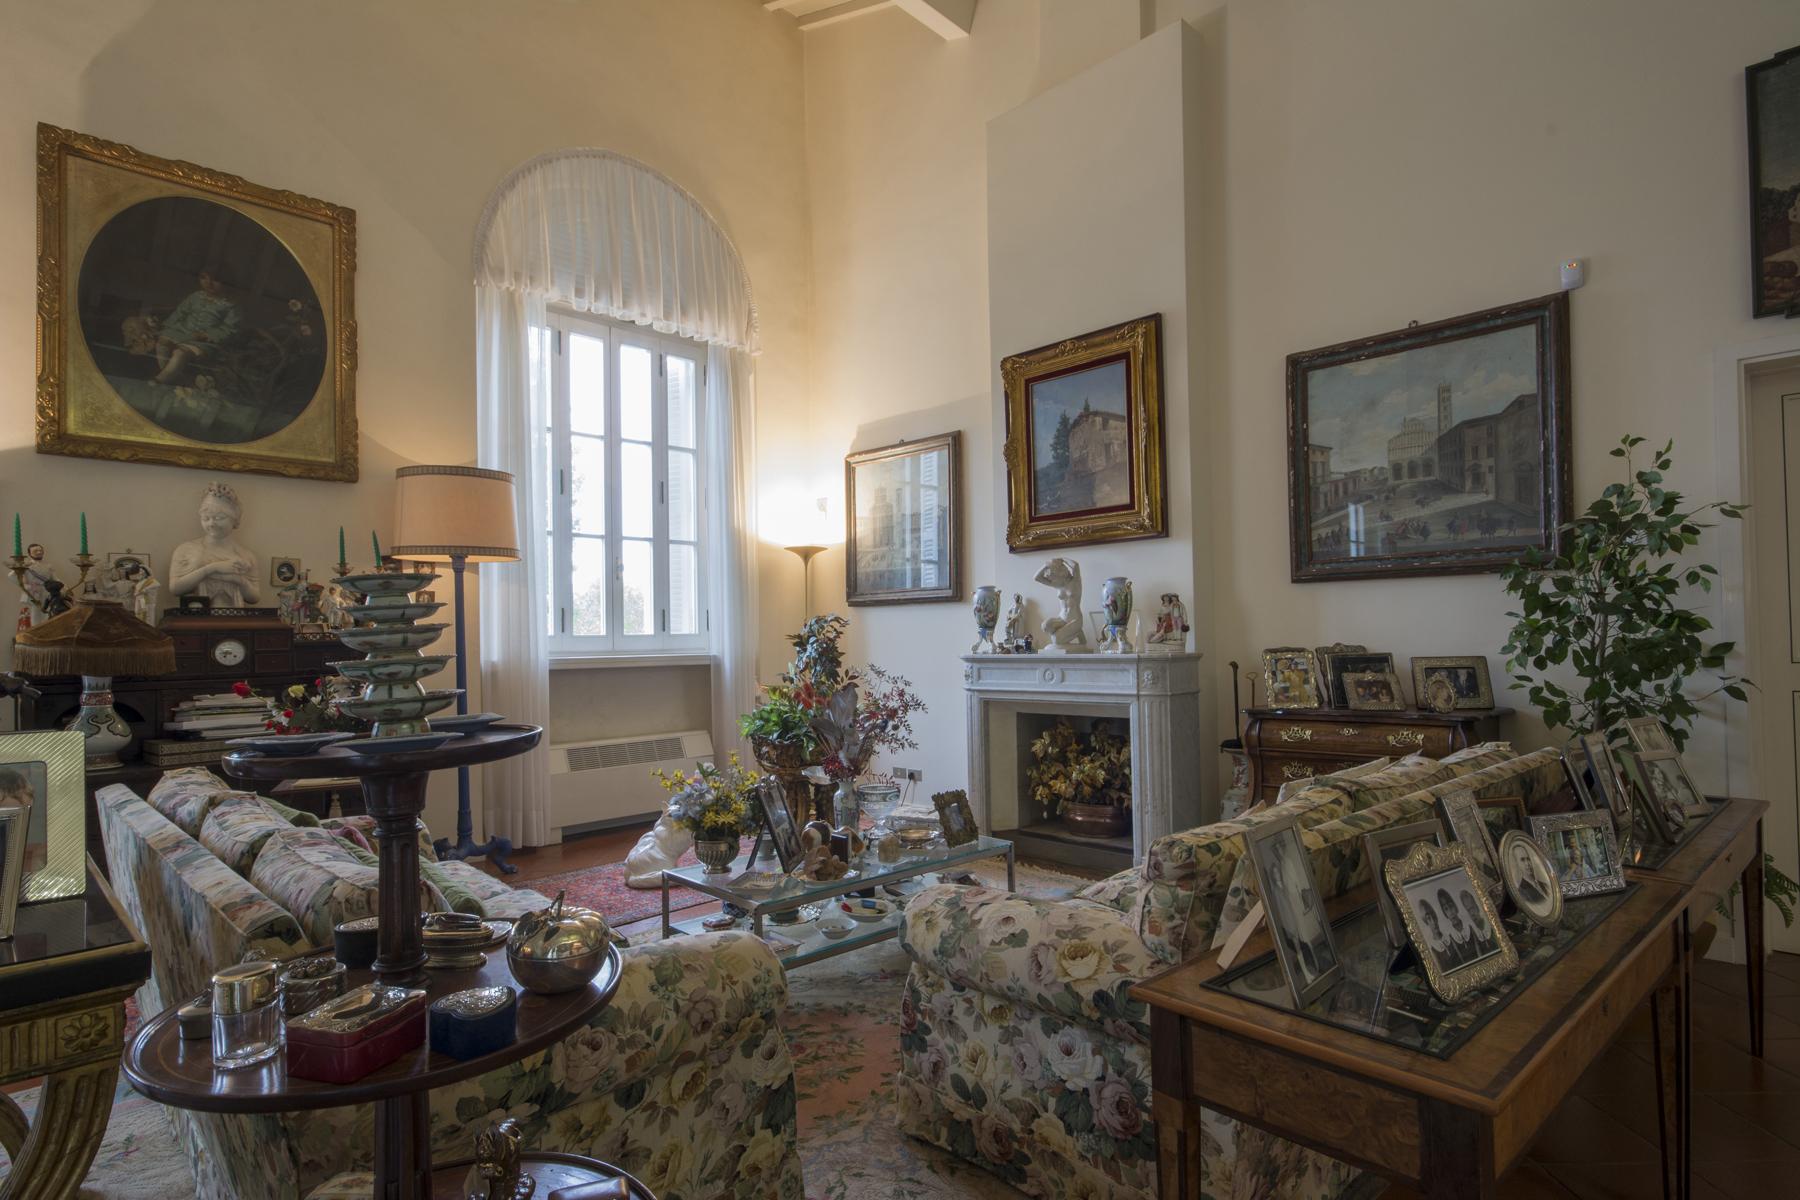 Villa in Vendita a Lucca: 5 locali, 2451 mq - Foto 10